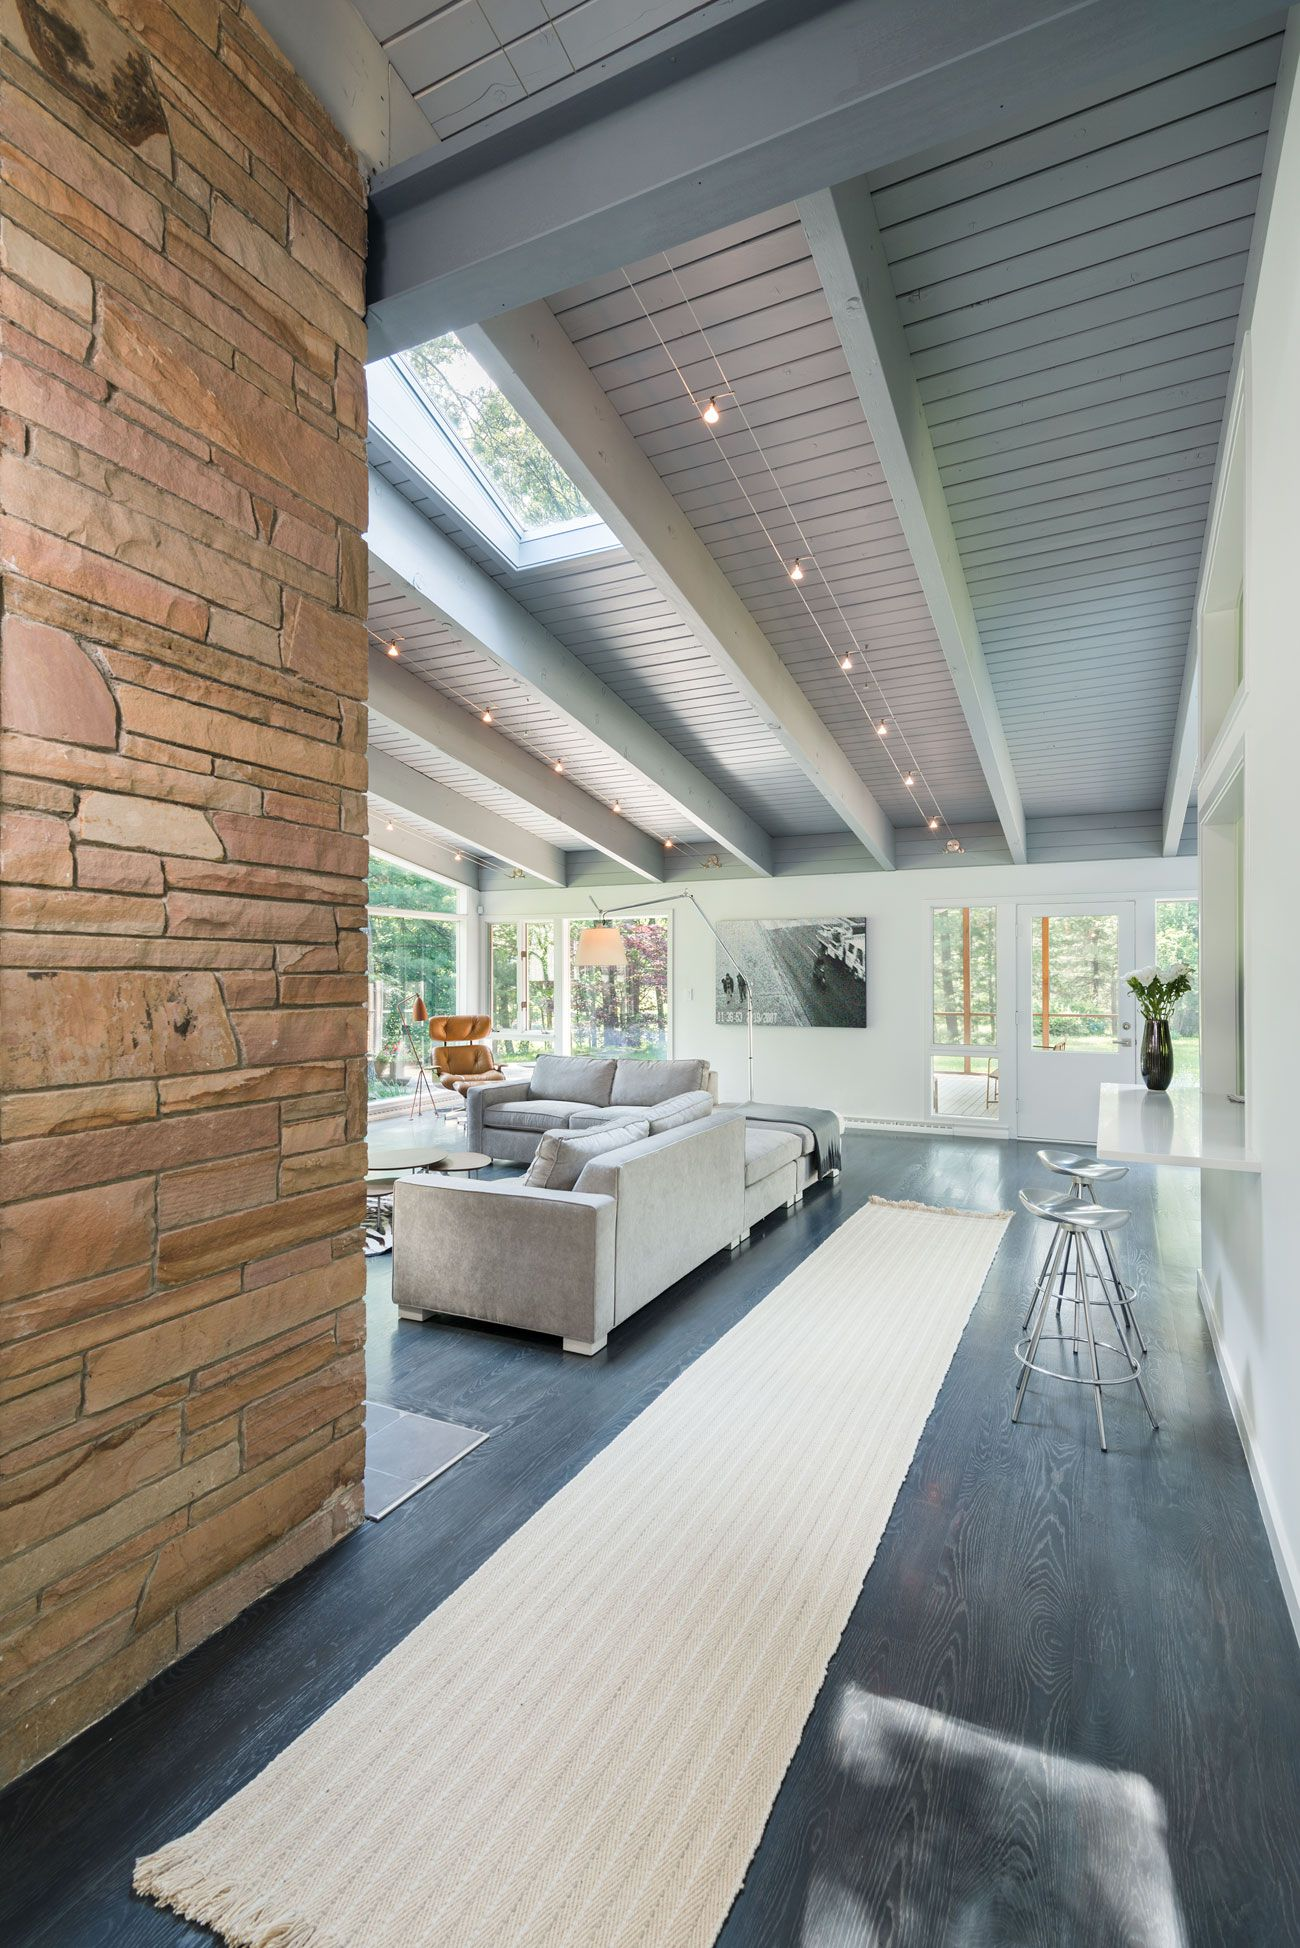 MidCentury Modern Home Design By Flavin Architects CAANdesign - Mid century home design